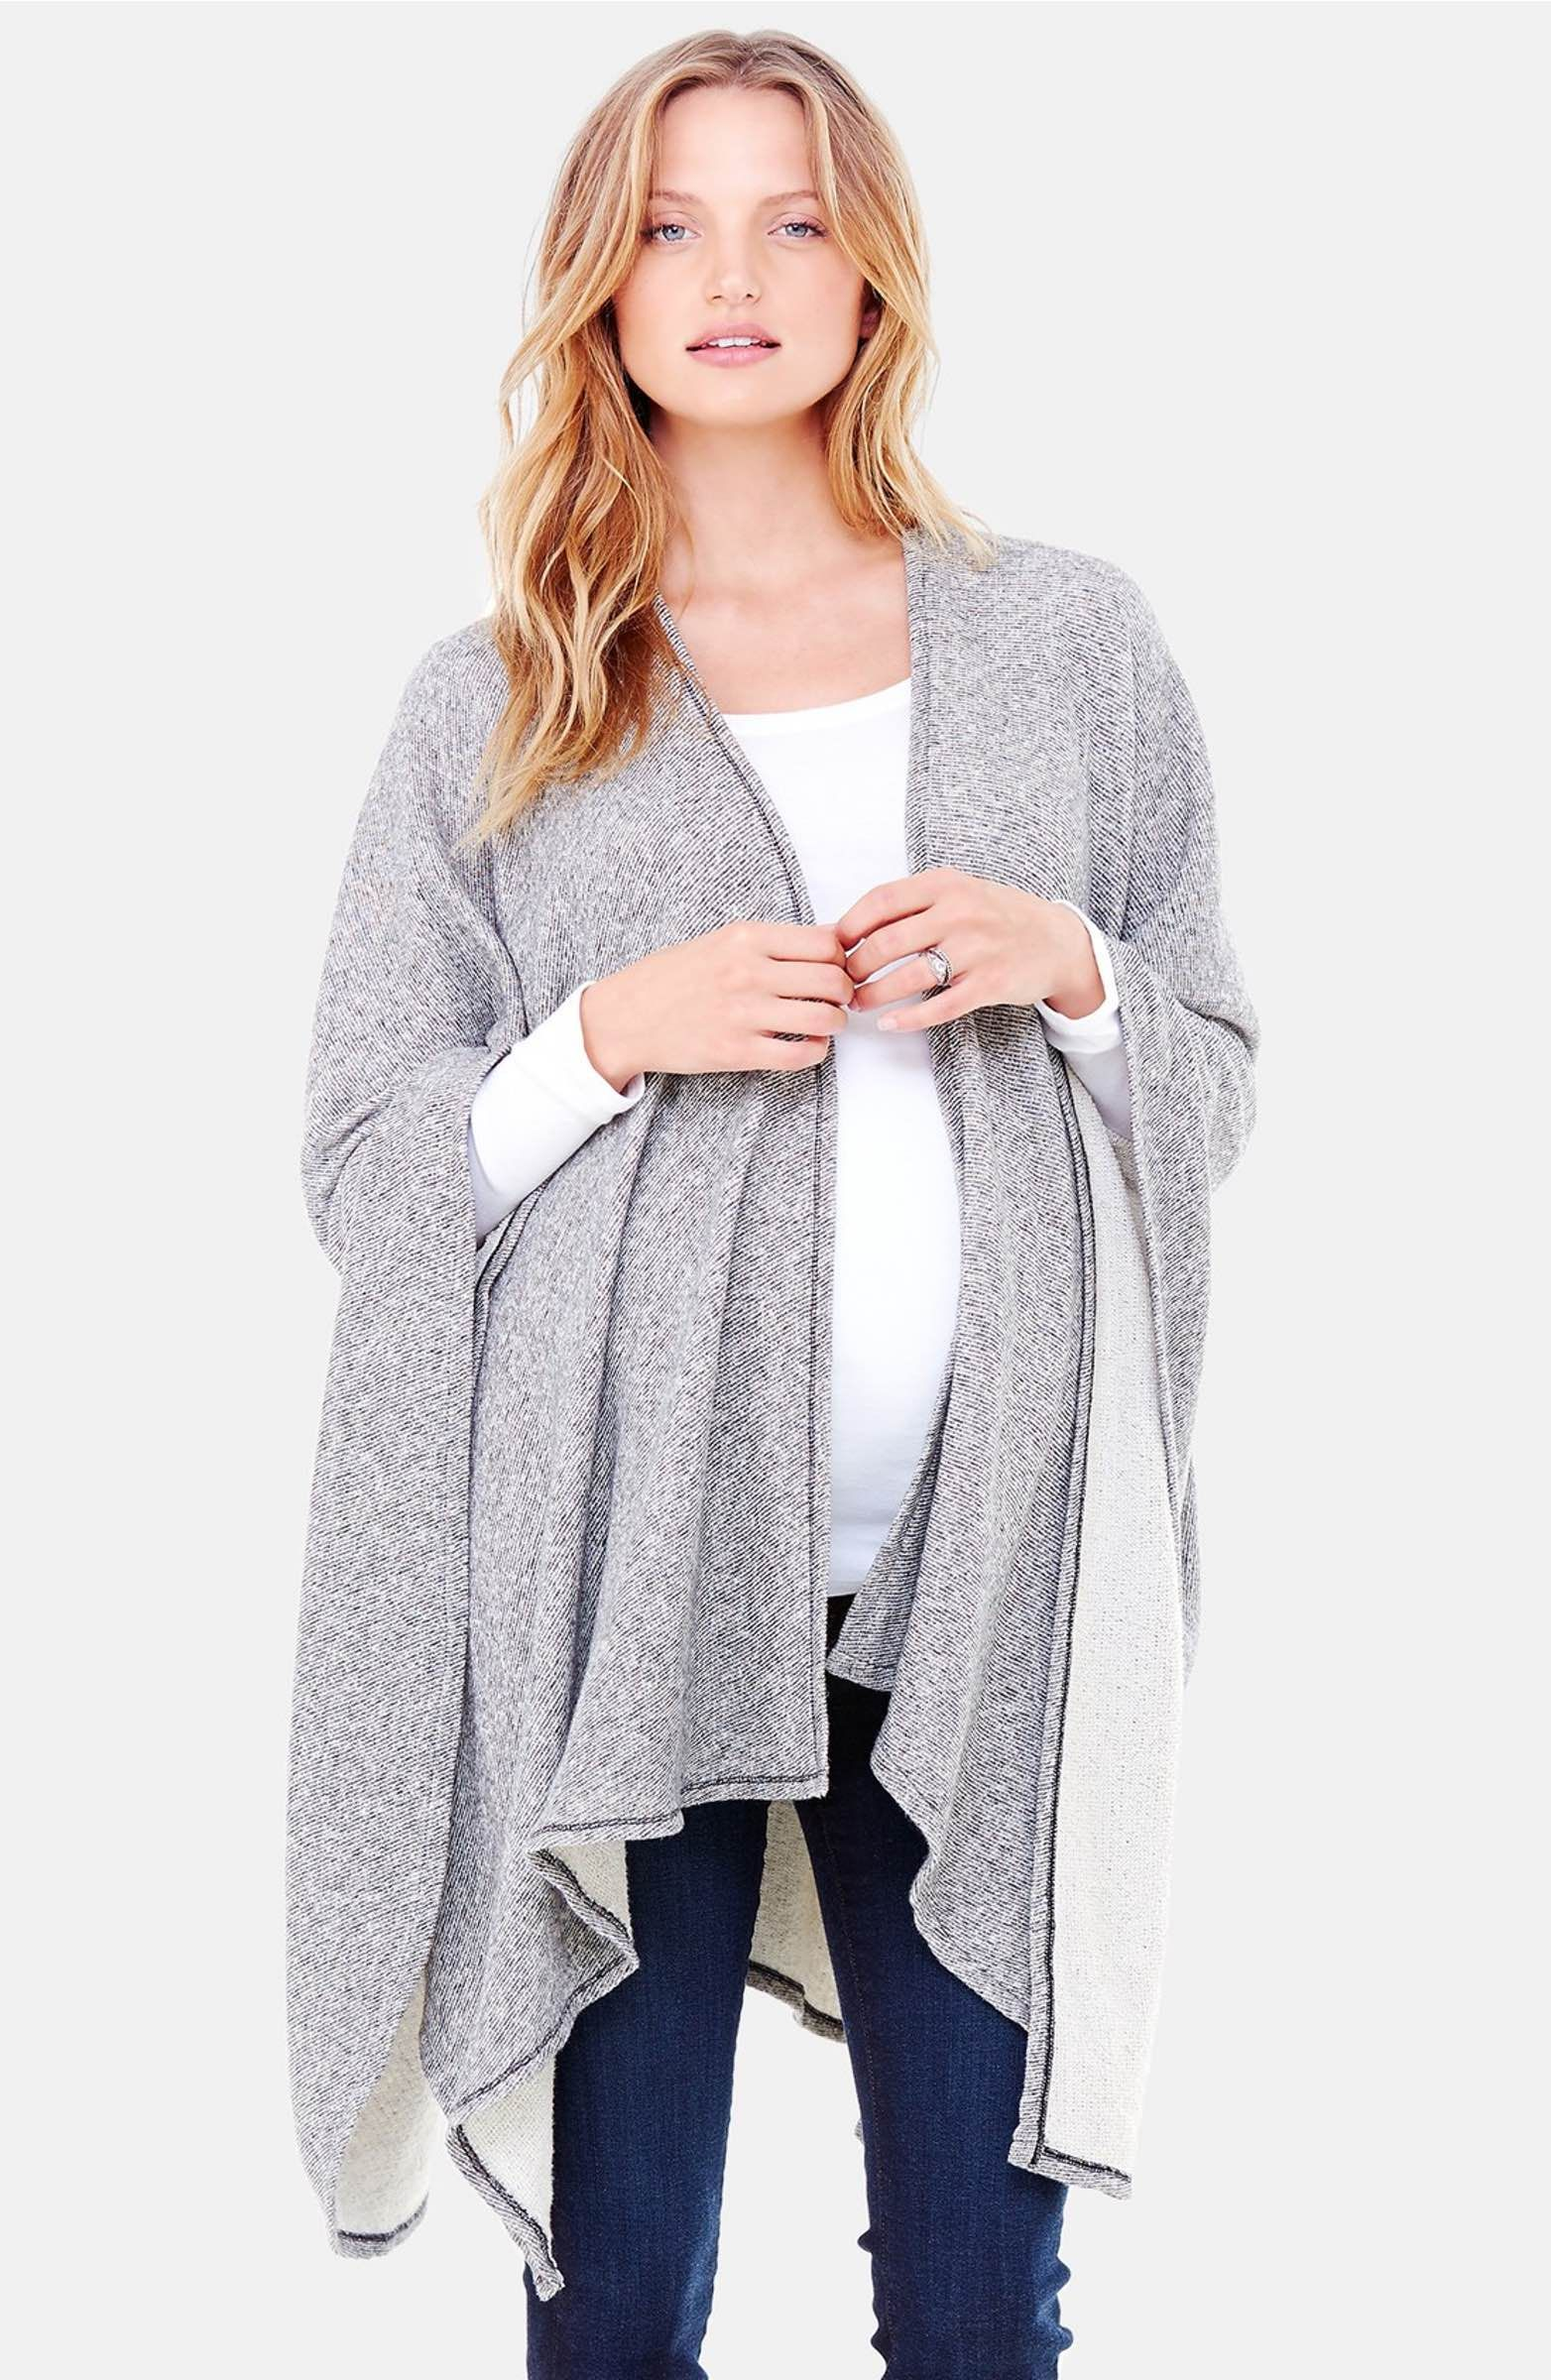 e58b6673520 Main Image - Ingrid & Isabel® 'Cozy' Maternity & Nursing Wrap | Bump ...